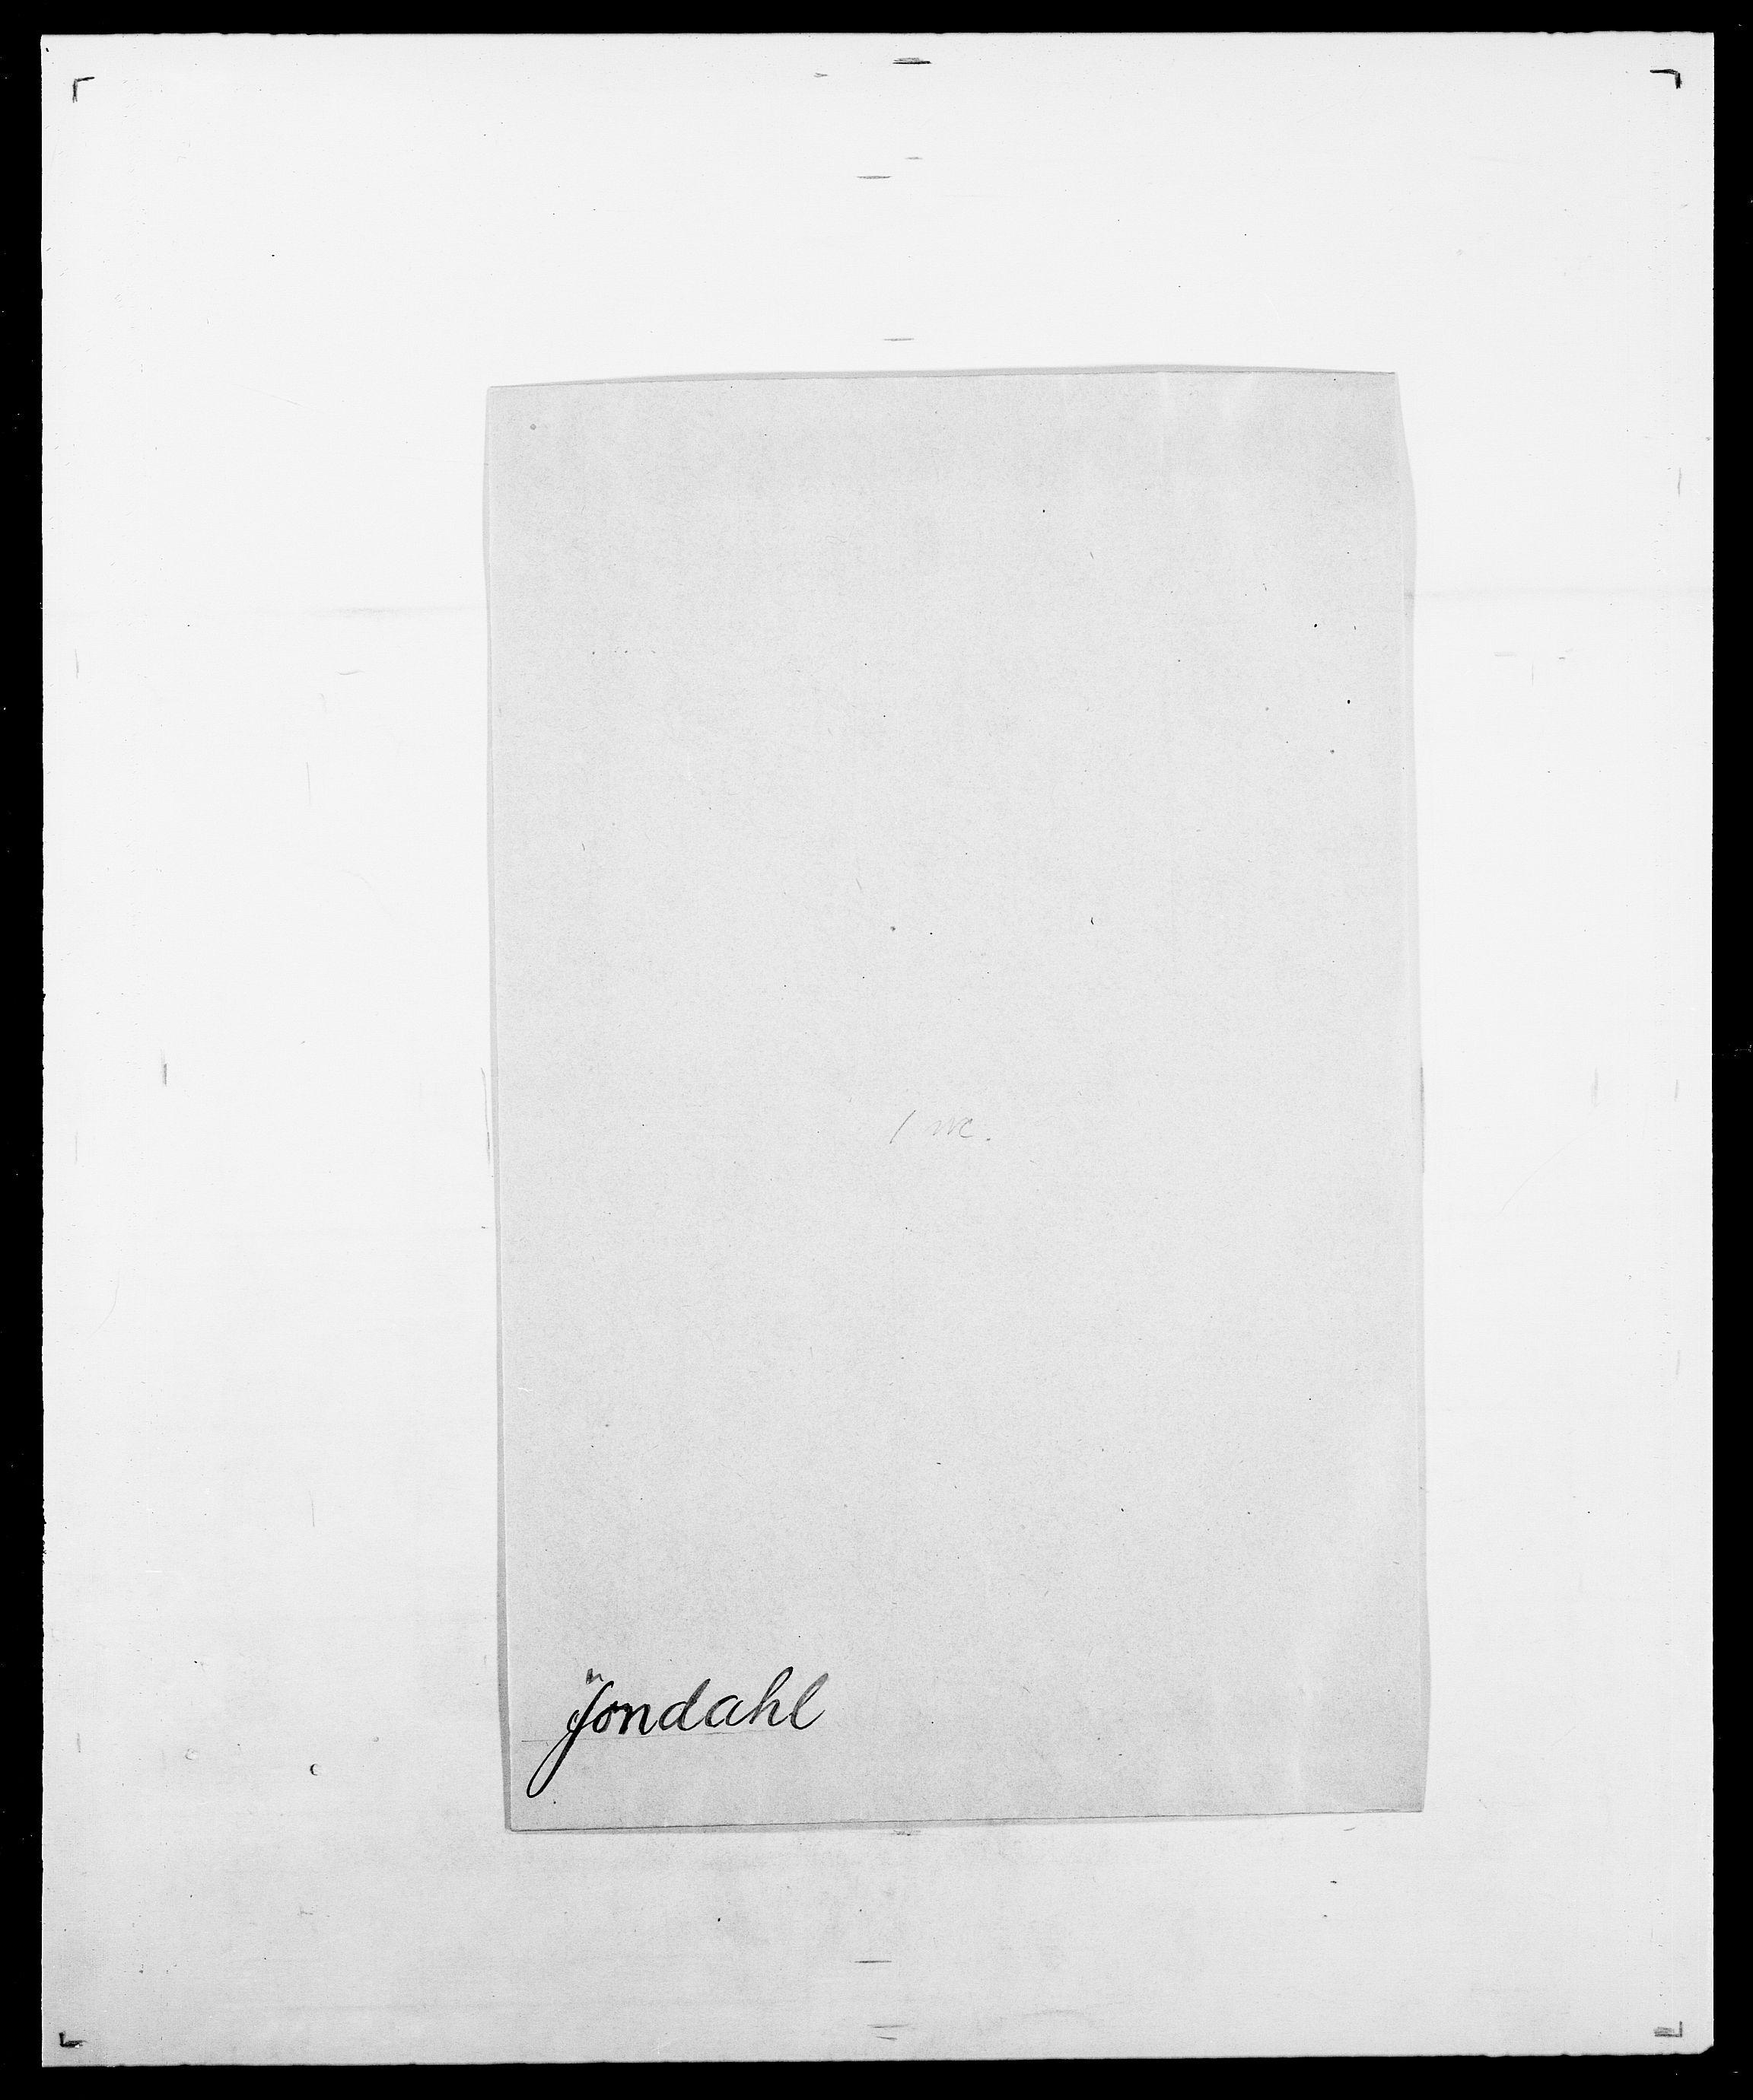 SAO, Delgobe, Charles Antoine - samling, D/Da/L0019: van der Hude - Joys, s. 883